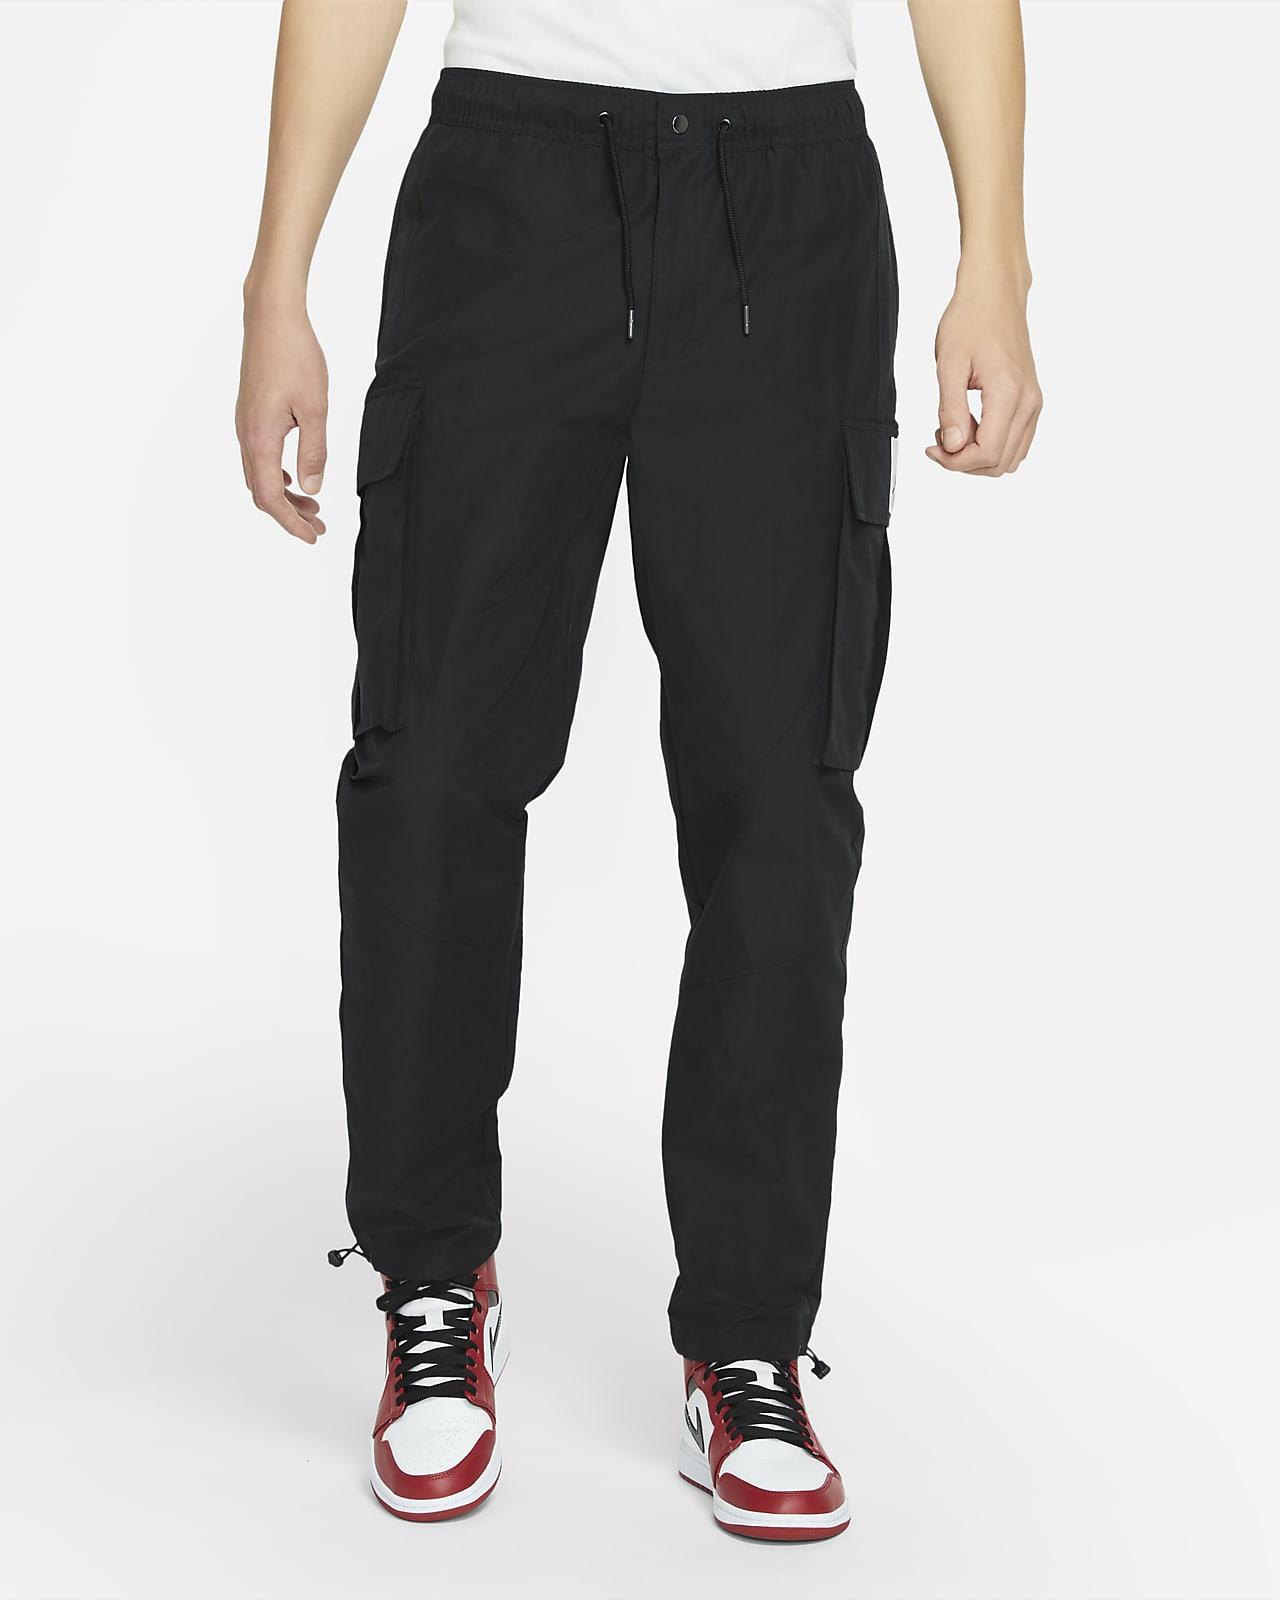 Pantalones de tejido Woven para hombre Jordan Flight